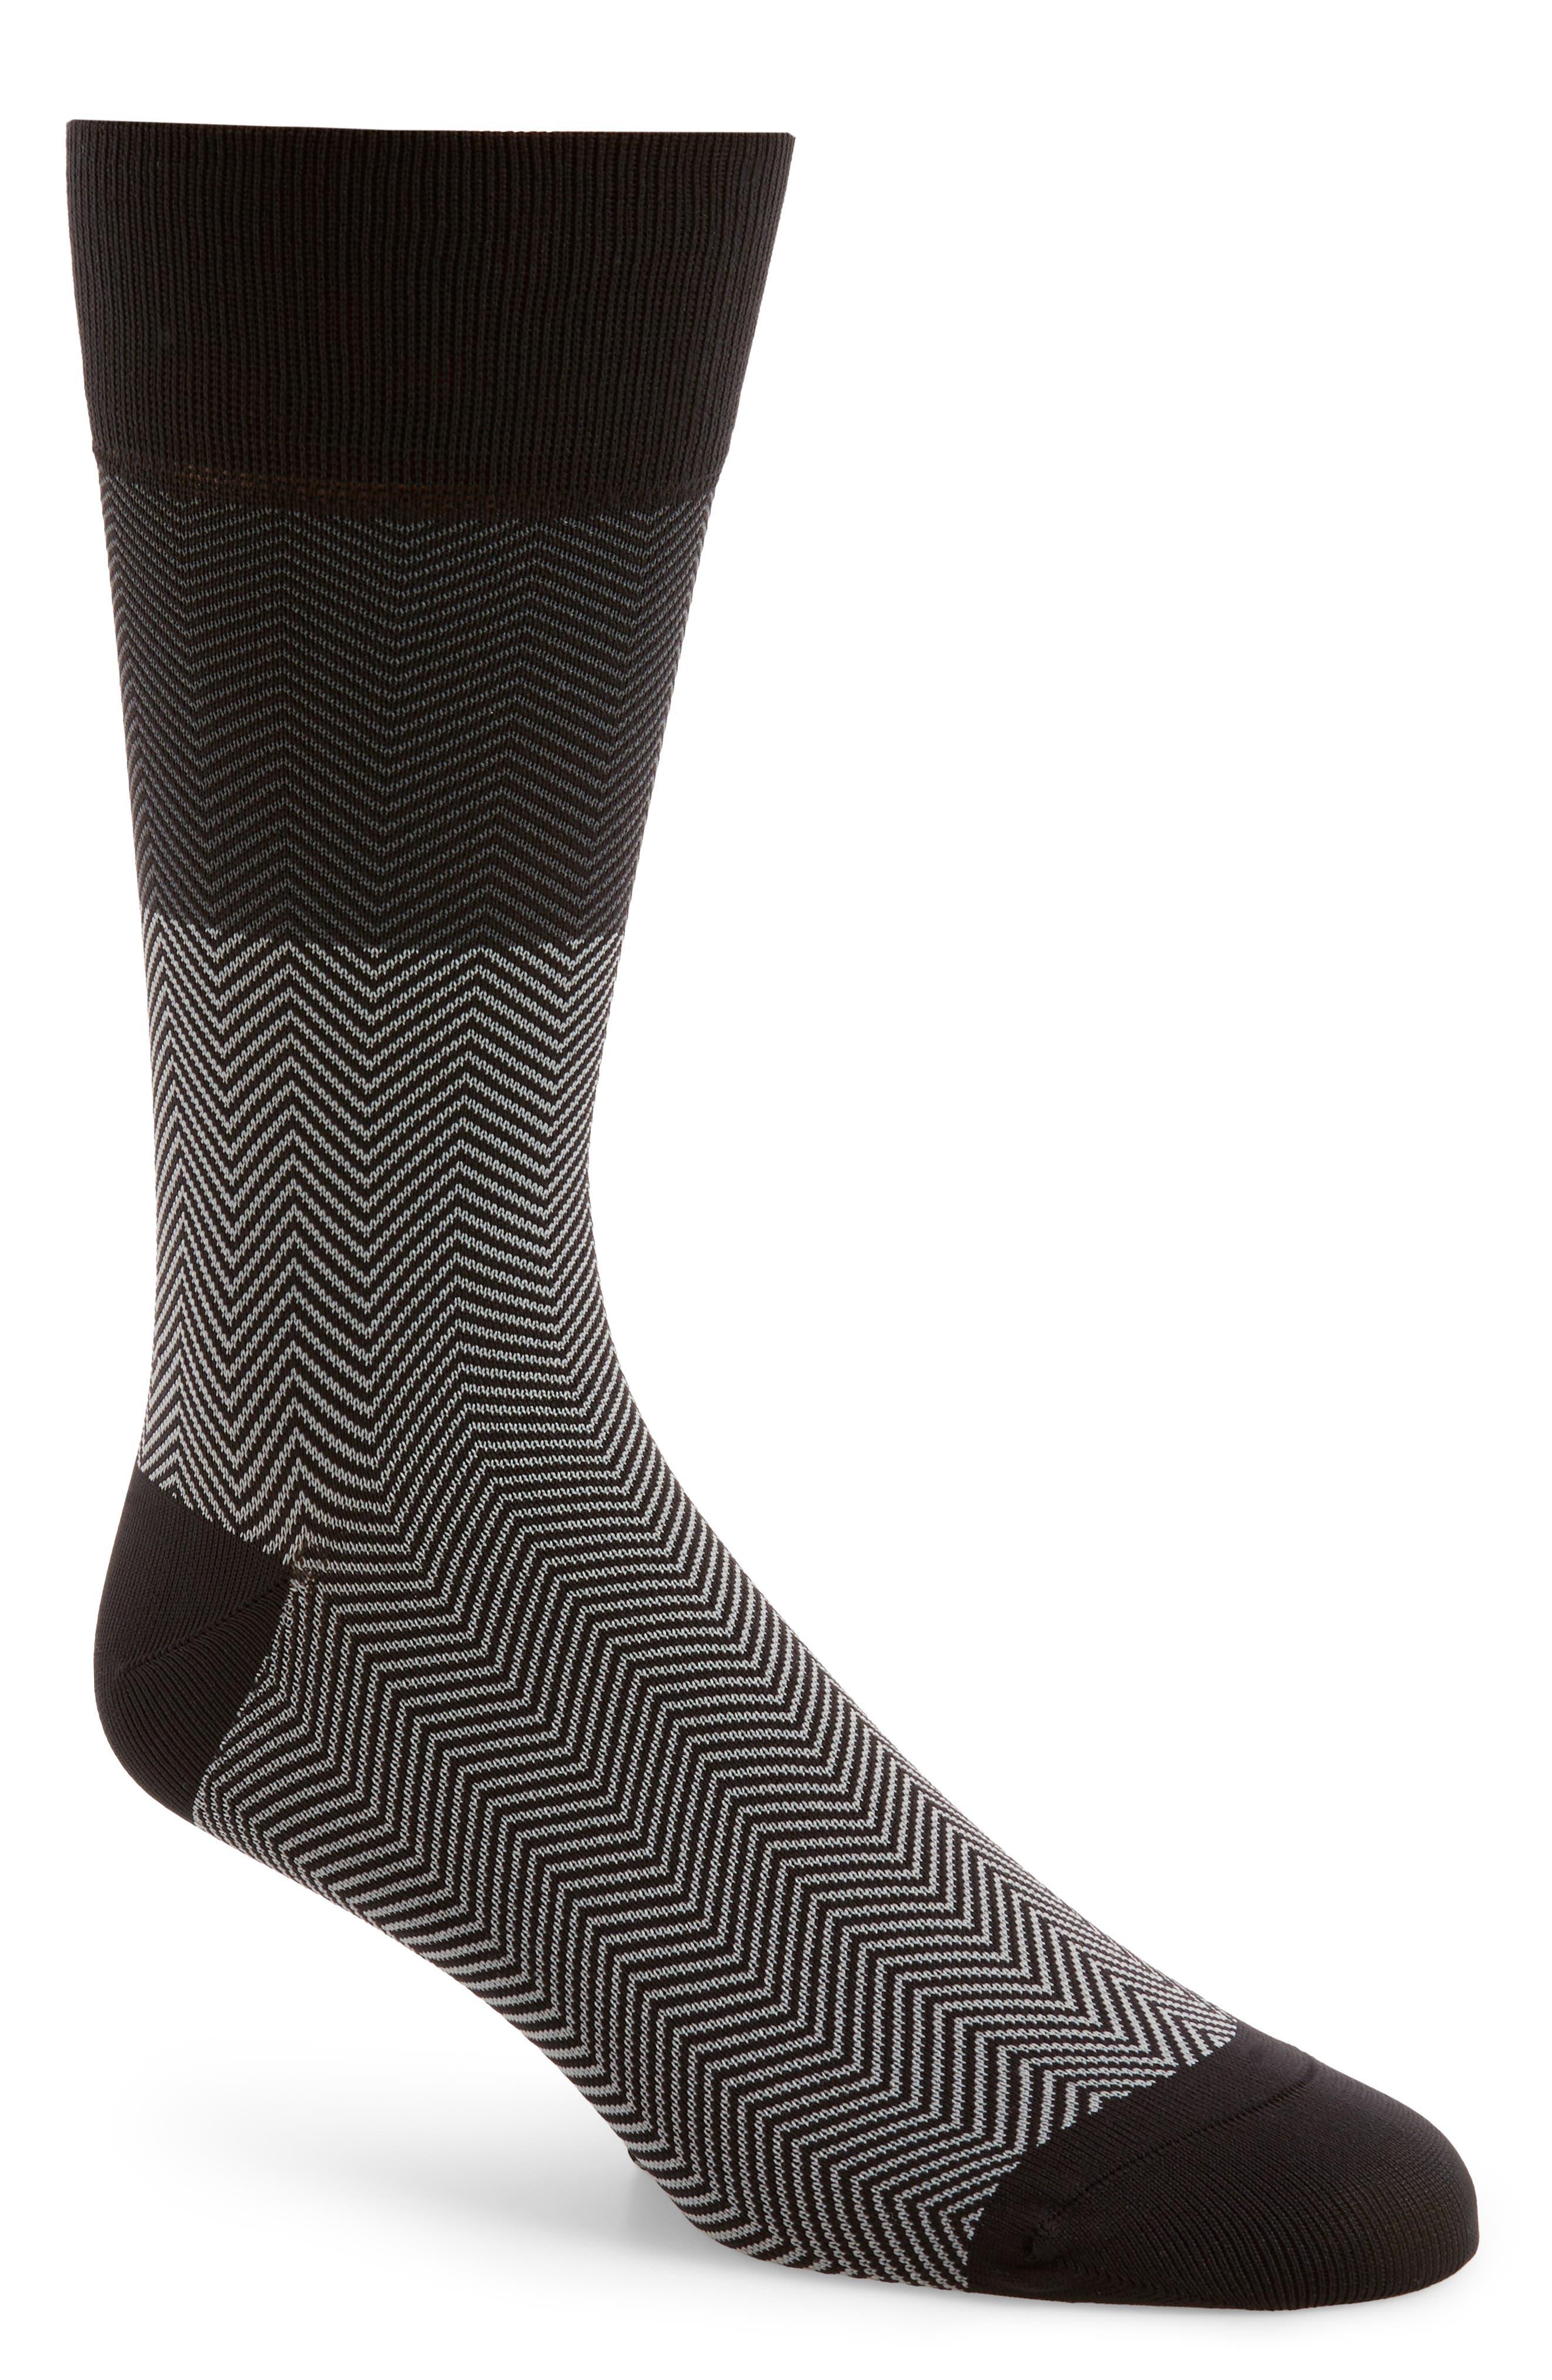 Herringbone Socks,                             Main thumbnail 1, color,                             Black